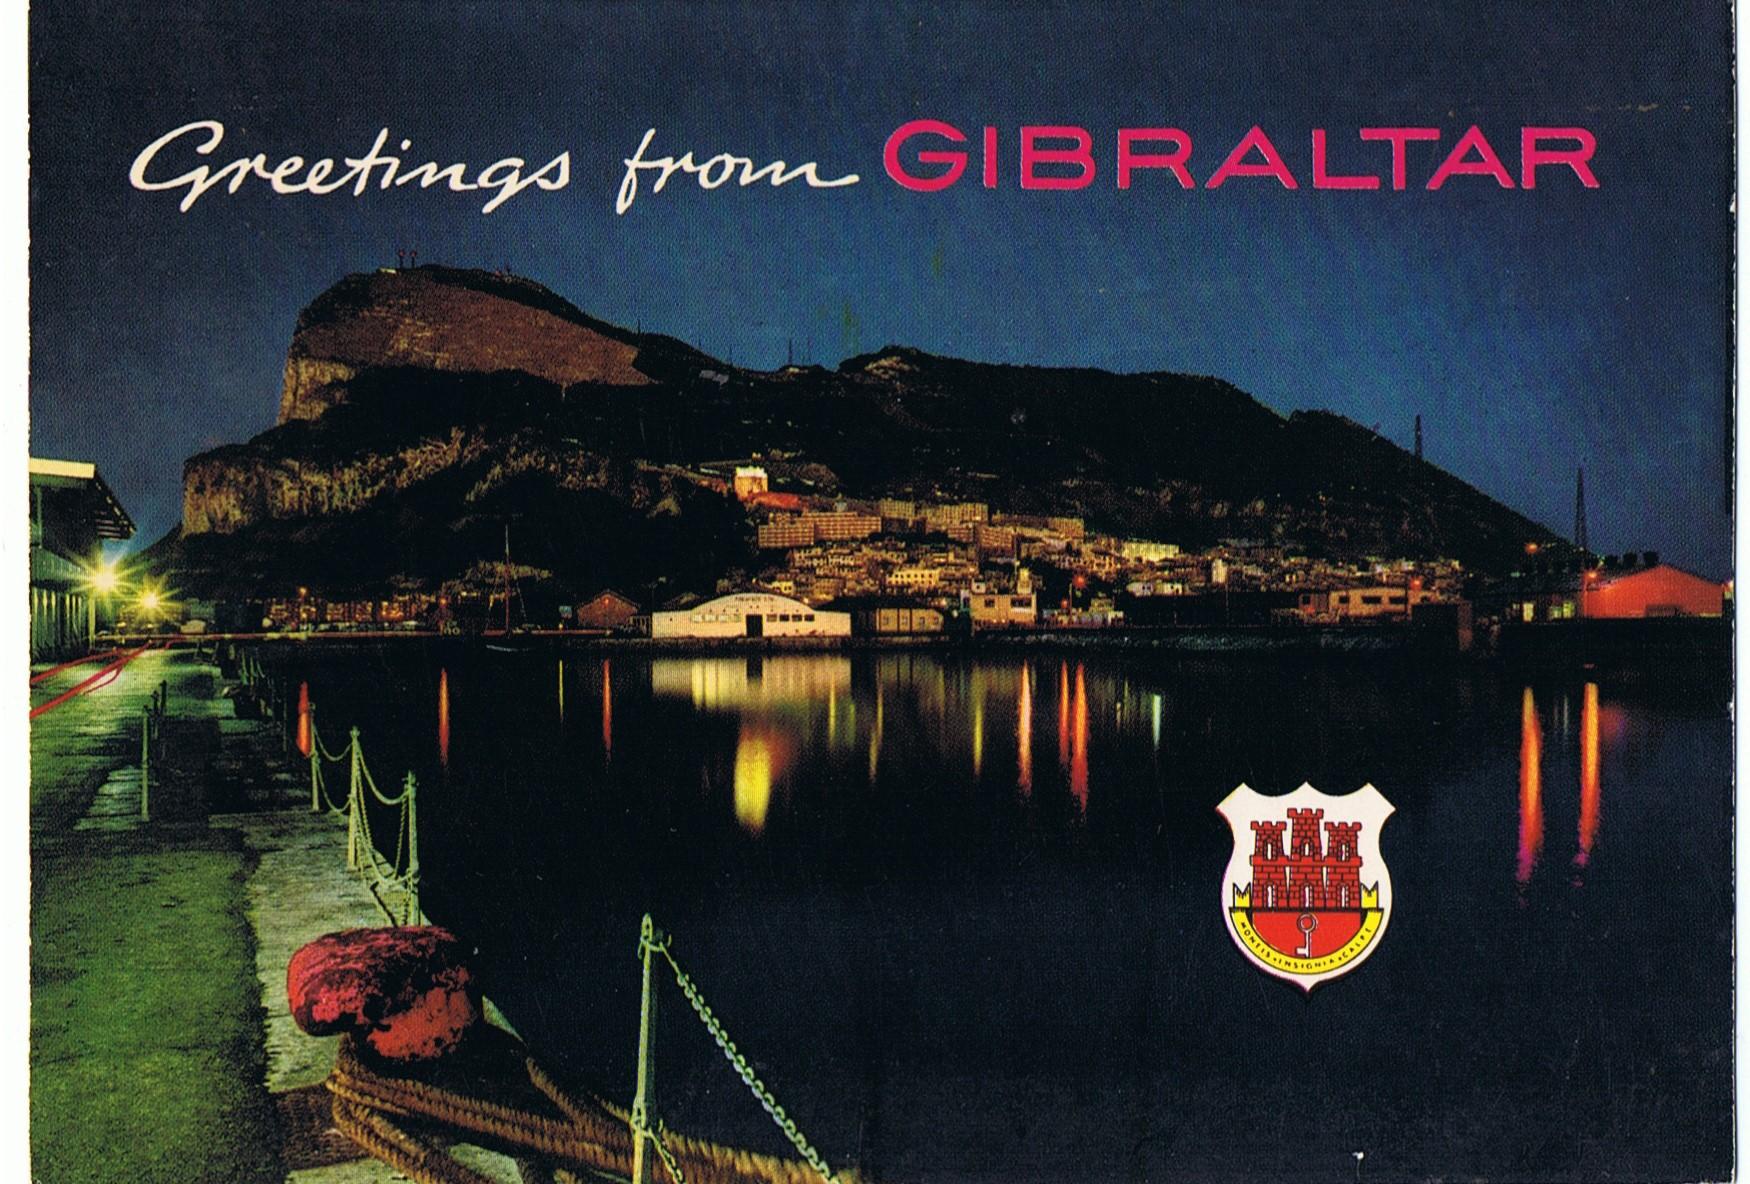 GibraltarFelsenNacht